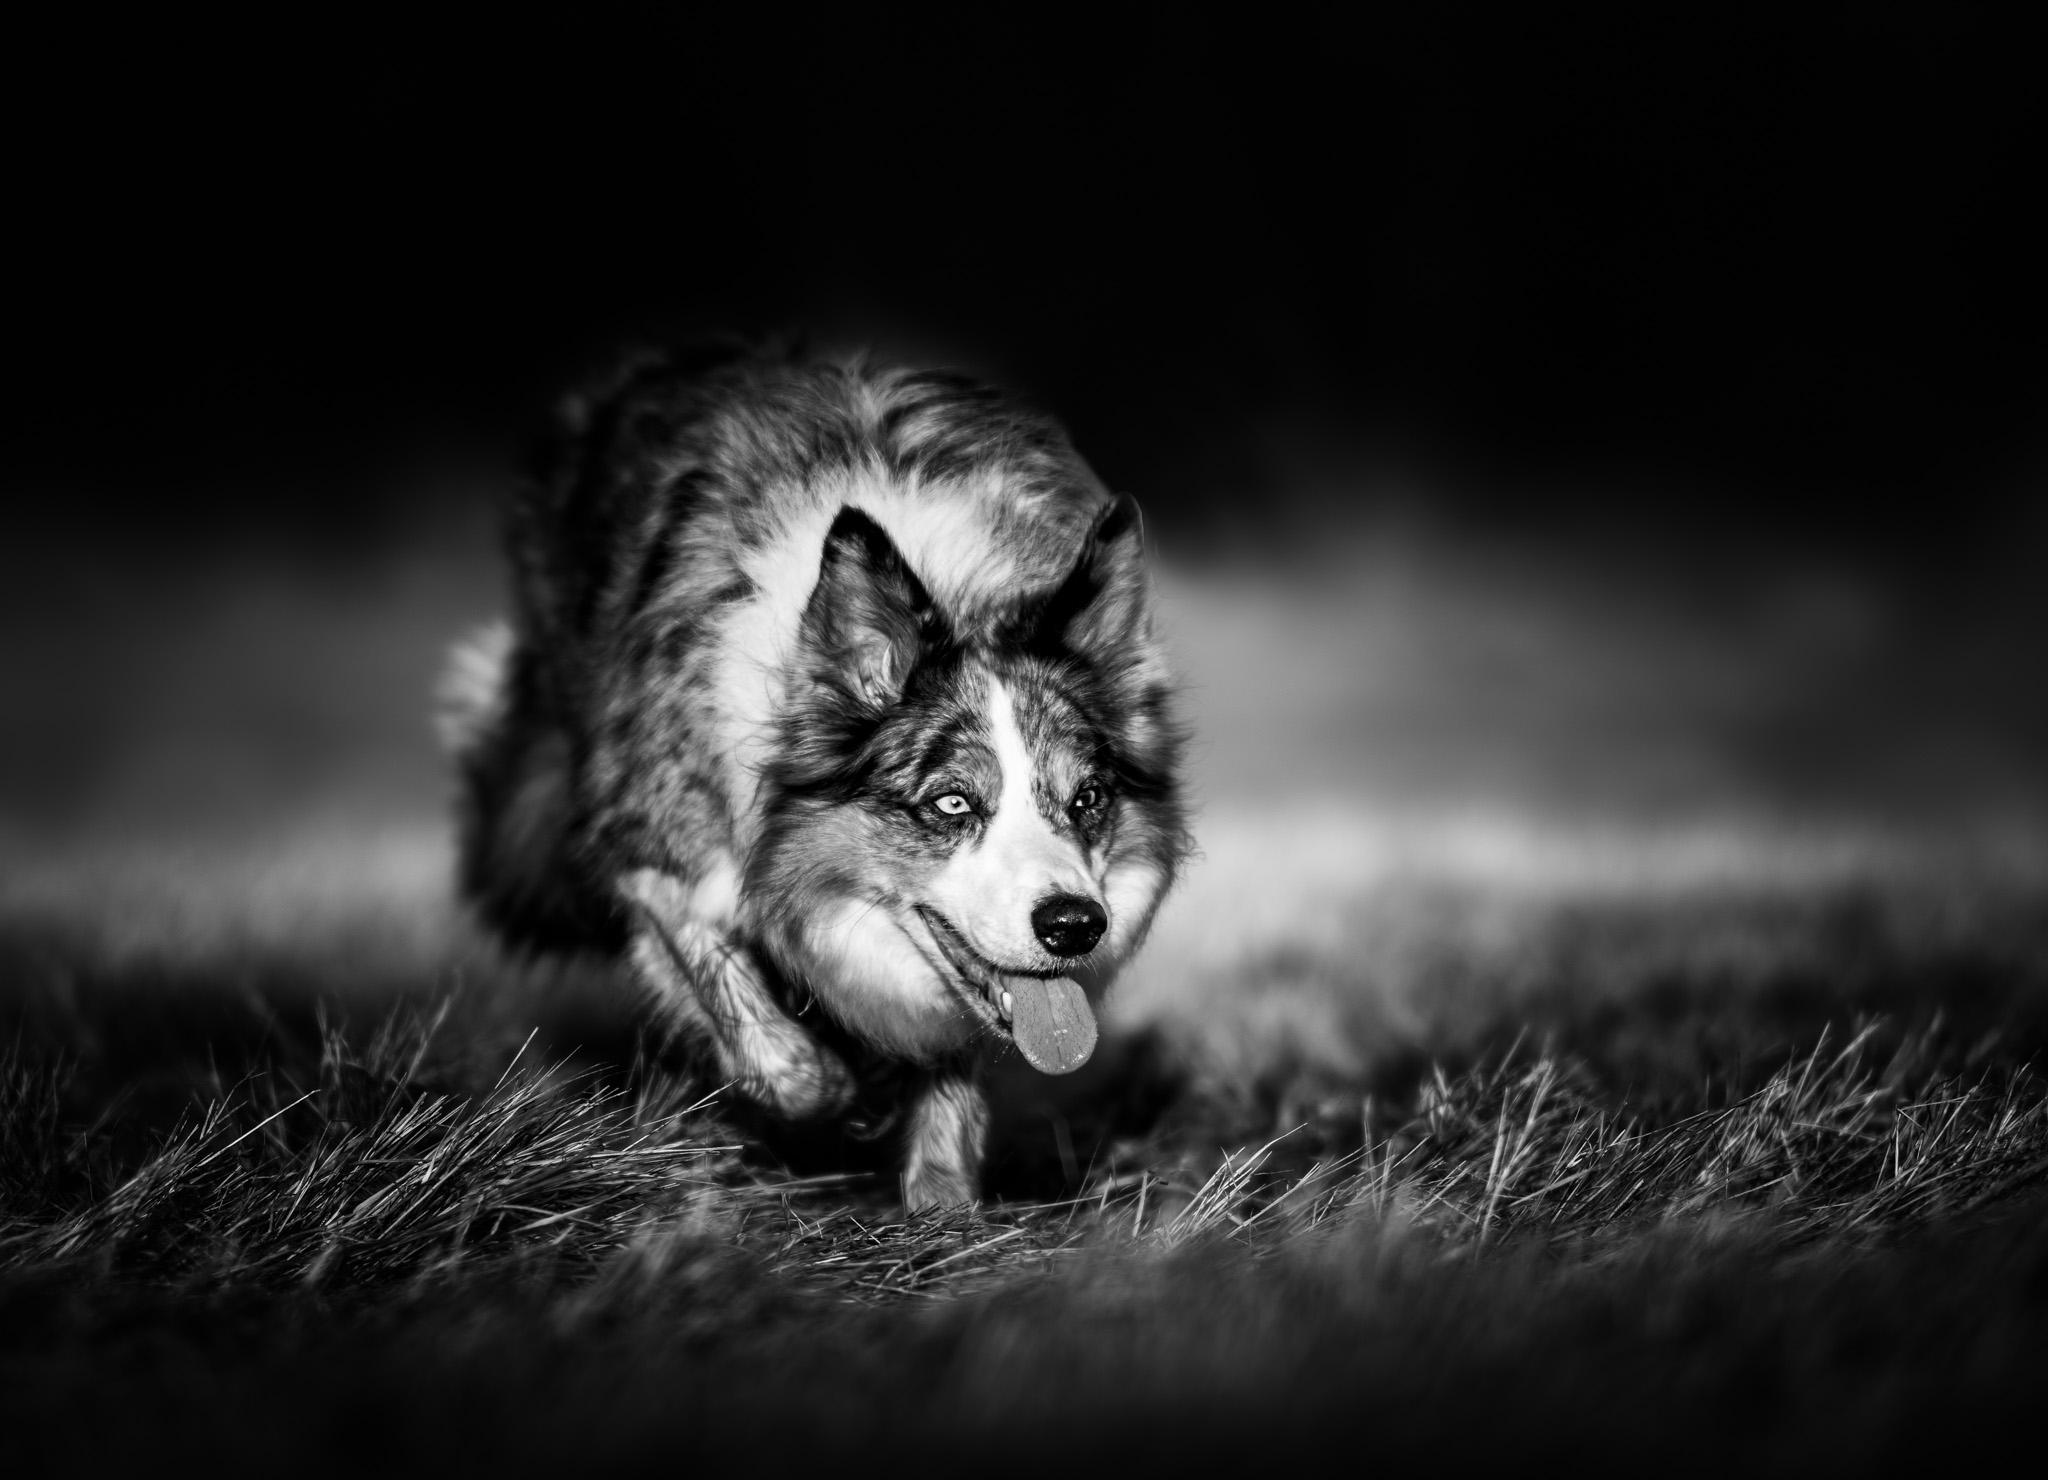 hundfotograf, hundfotografering, hundfoto svartvitt